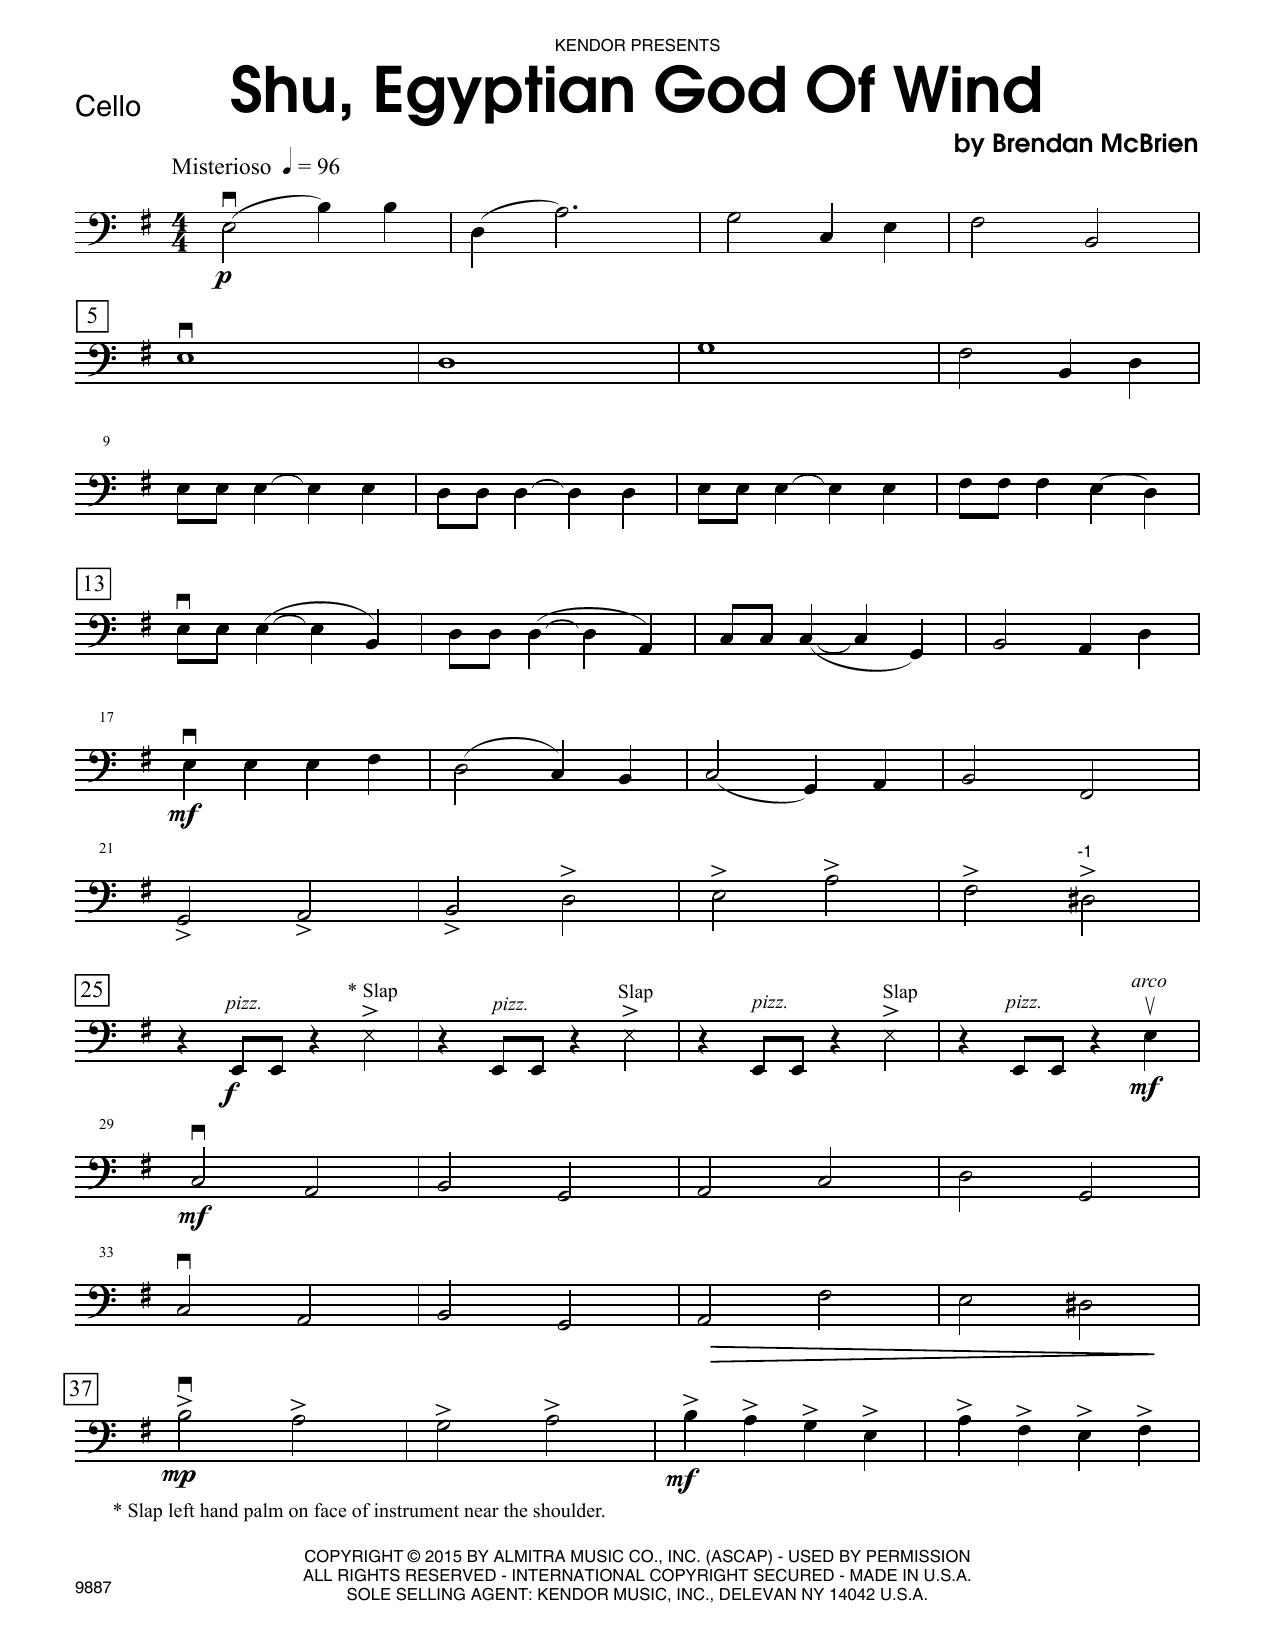 Shu, Egyptian God Of Wind - Cello Sheet Music